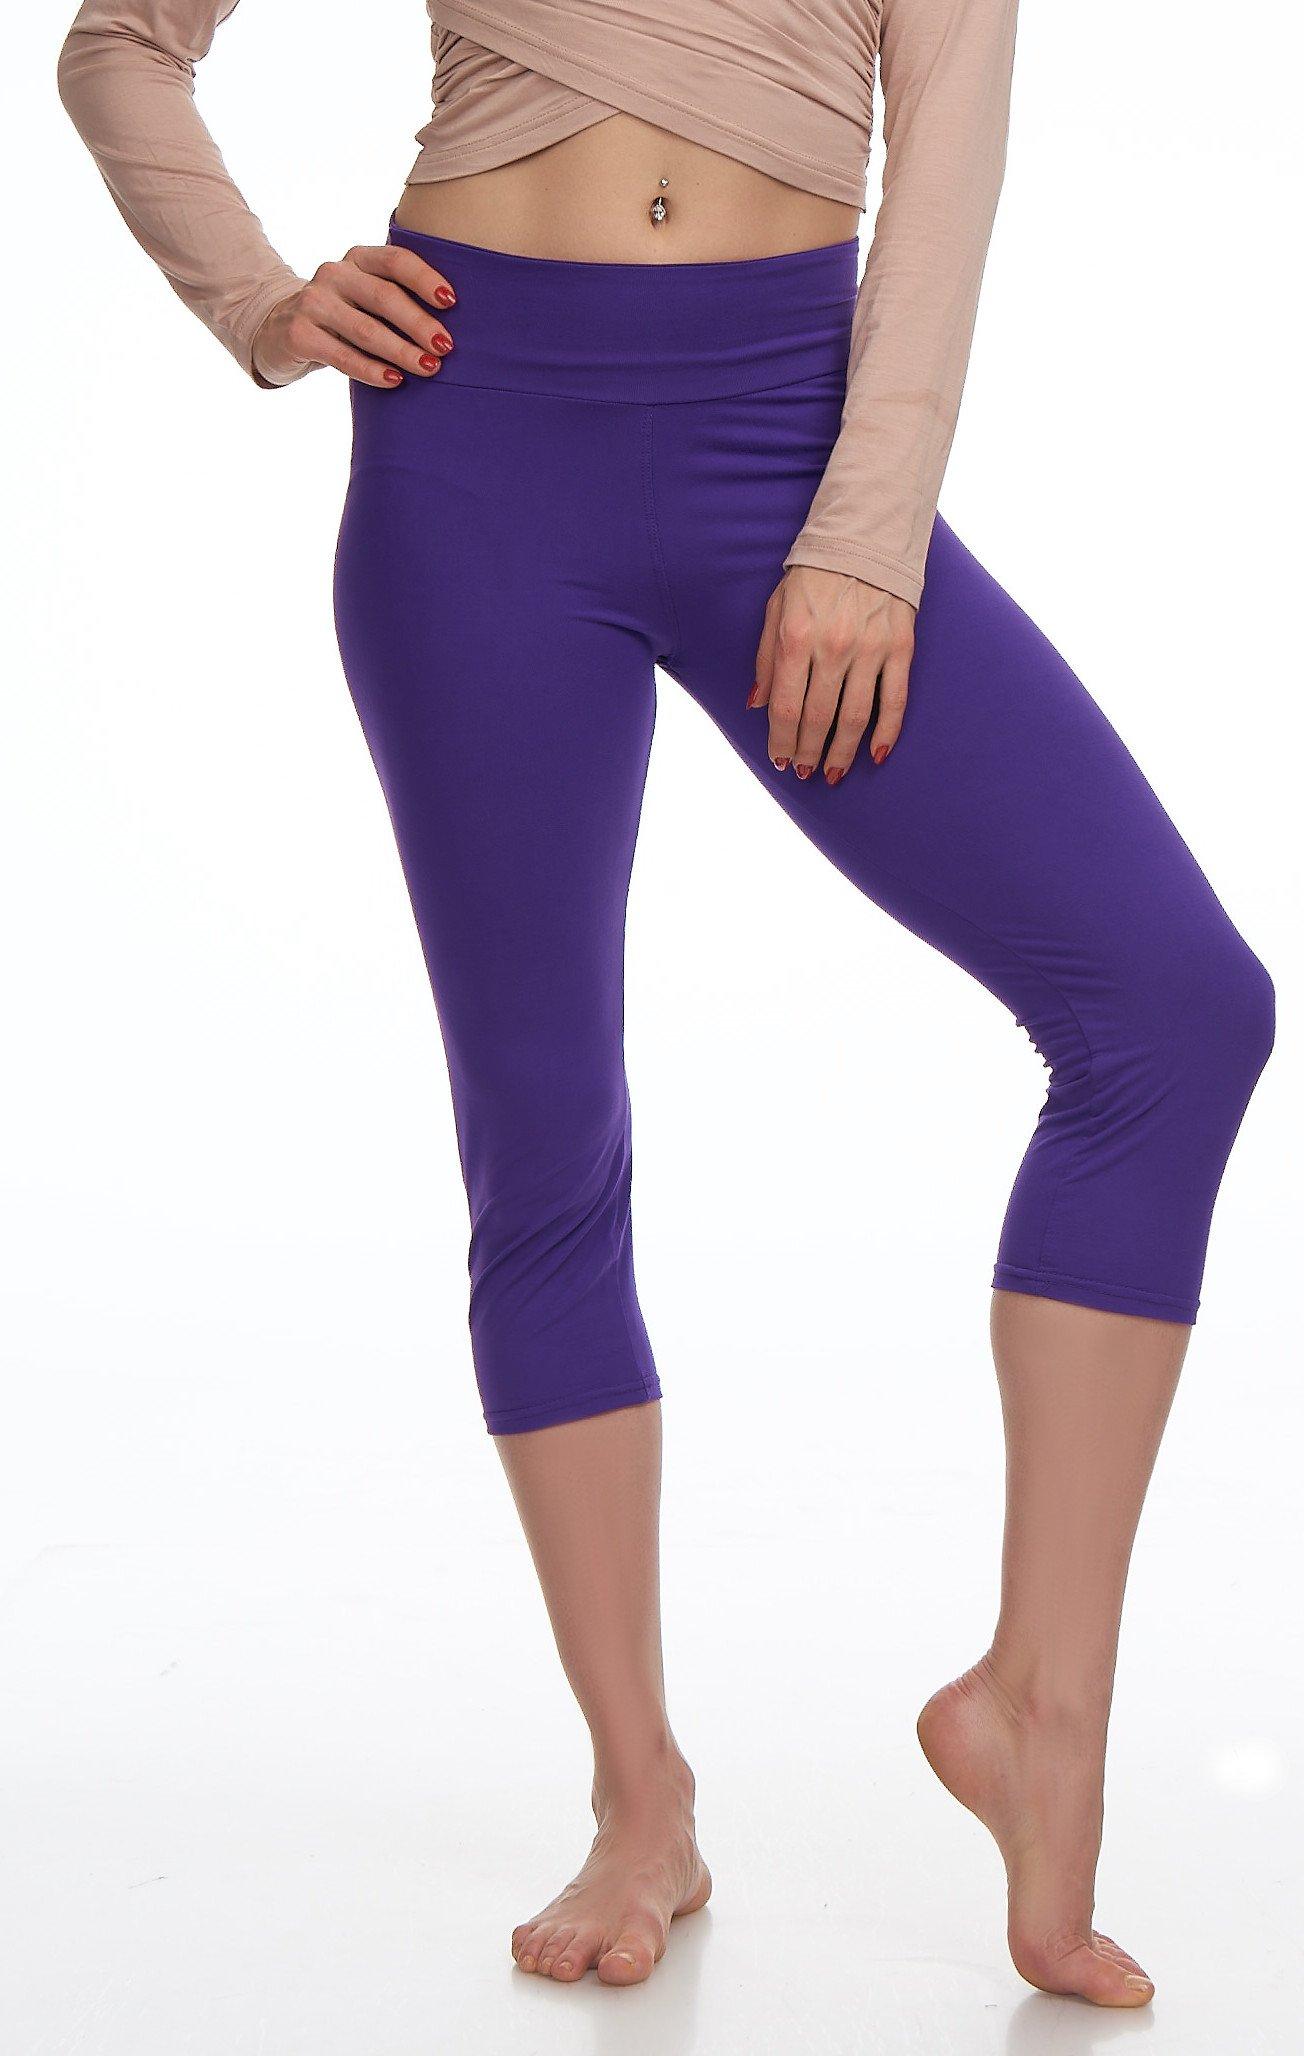 Lush Moda Extra Soft Leggings Variety of ColorsPlus Size Yoga Waist Purple, One Size fits Most (XL 3XL), Purple Yoga Waist by LMB (Image #2)